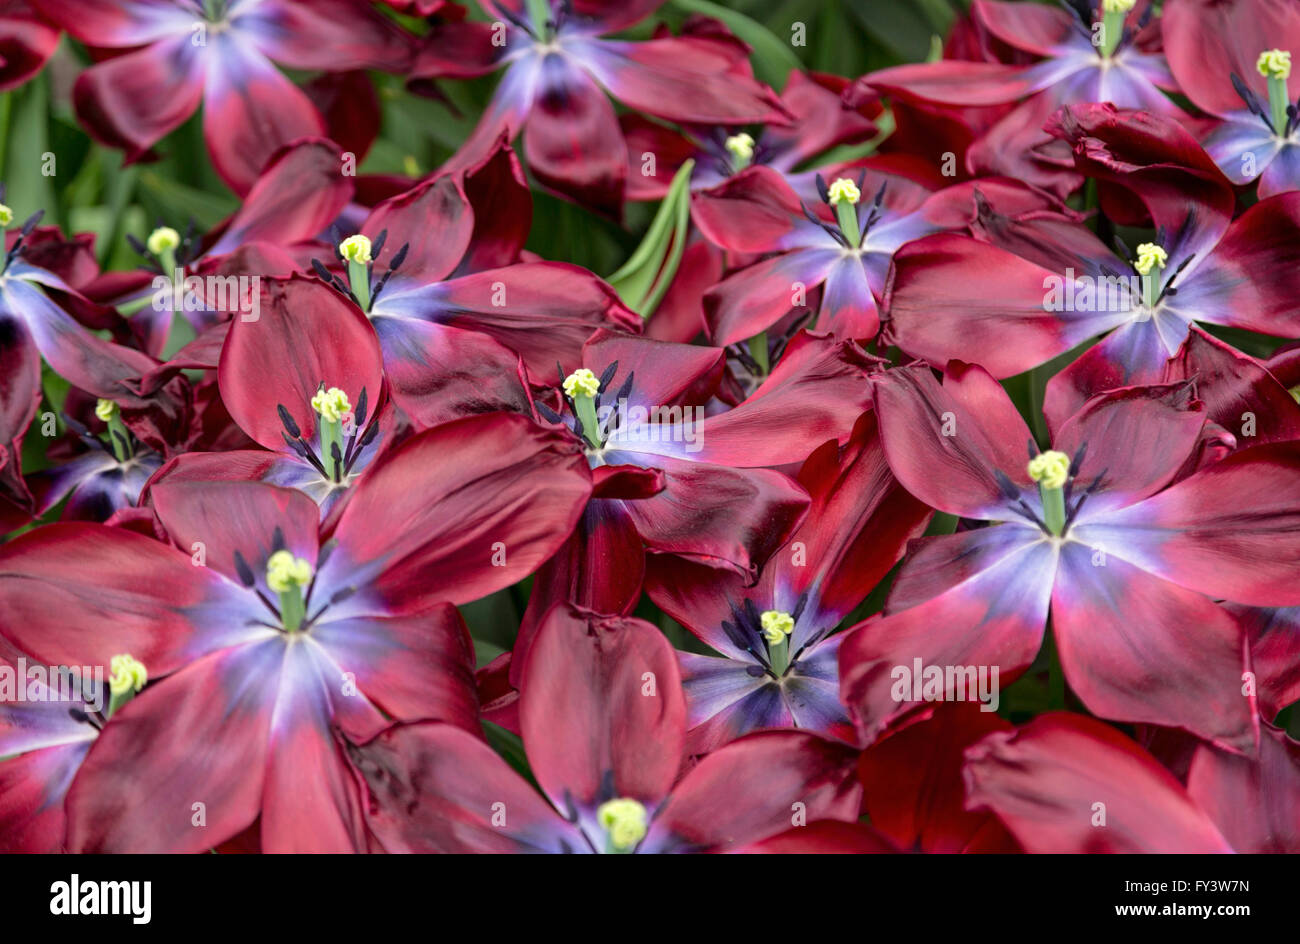 Tulipa 'Lasting Love' in the Willem-Alexander Pavilion at Keukenhof, one the world's famous flower gardens, - Stock Image